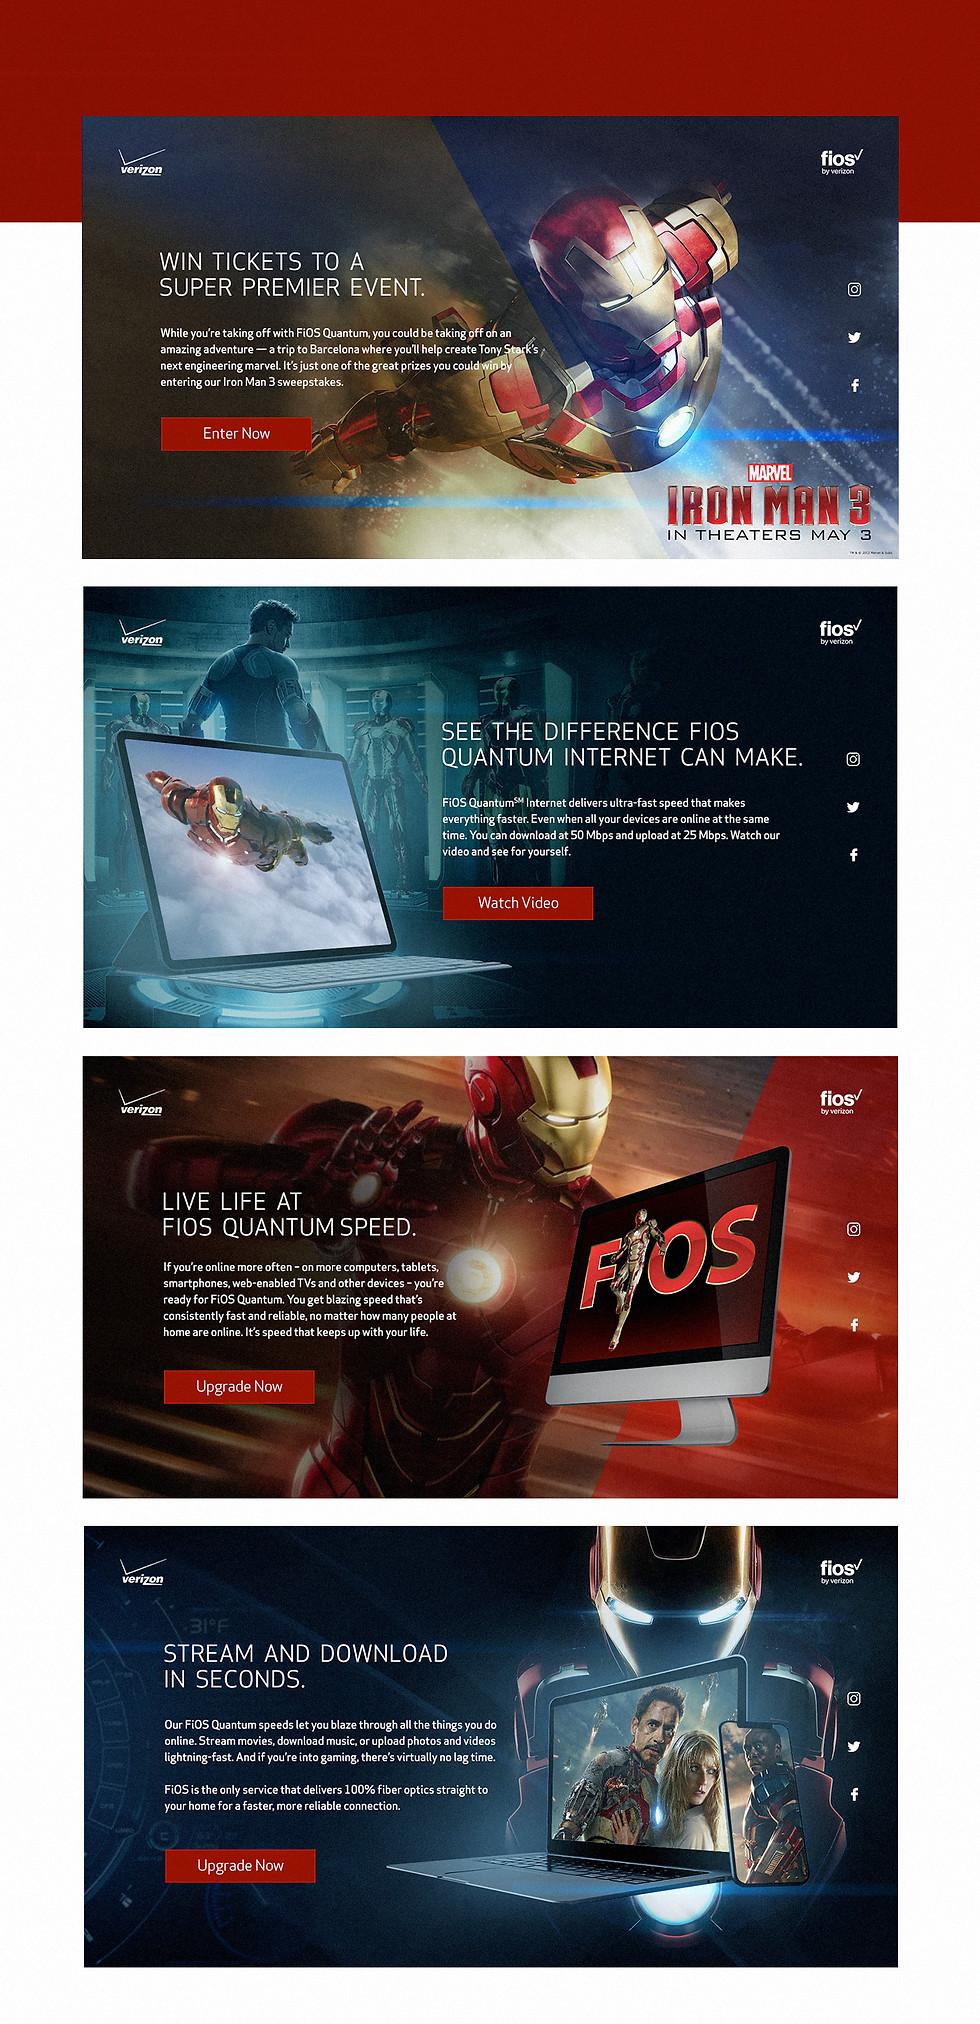 Verizon_Iron_Man_Campaign_113019_Web_04.